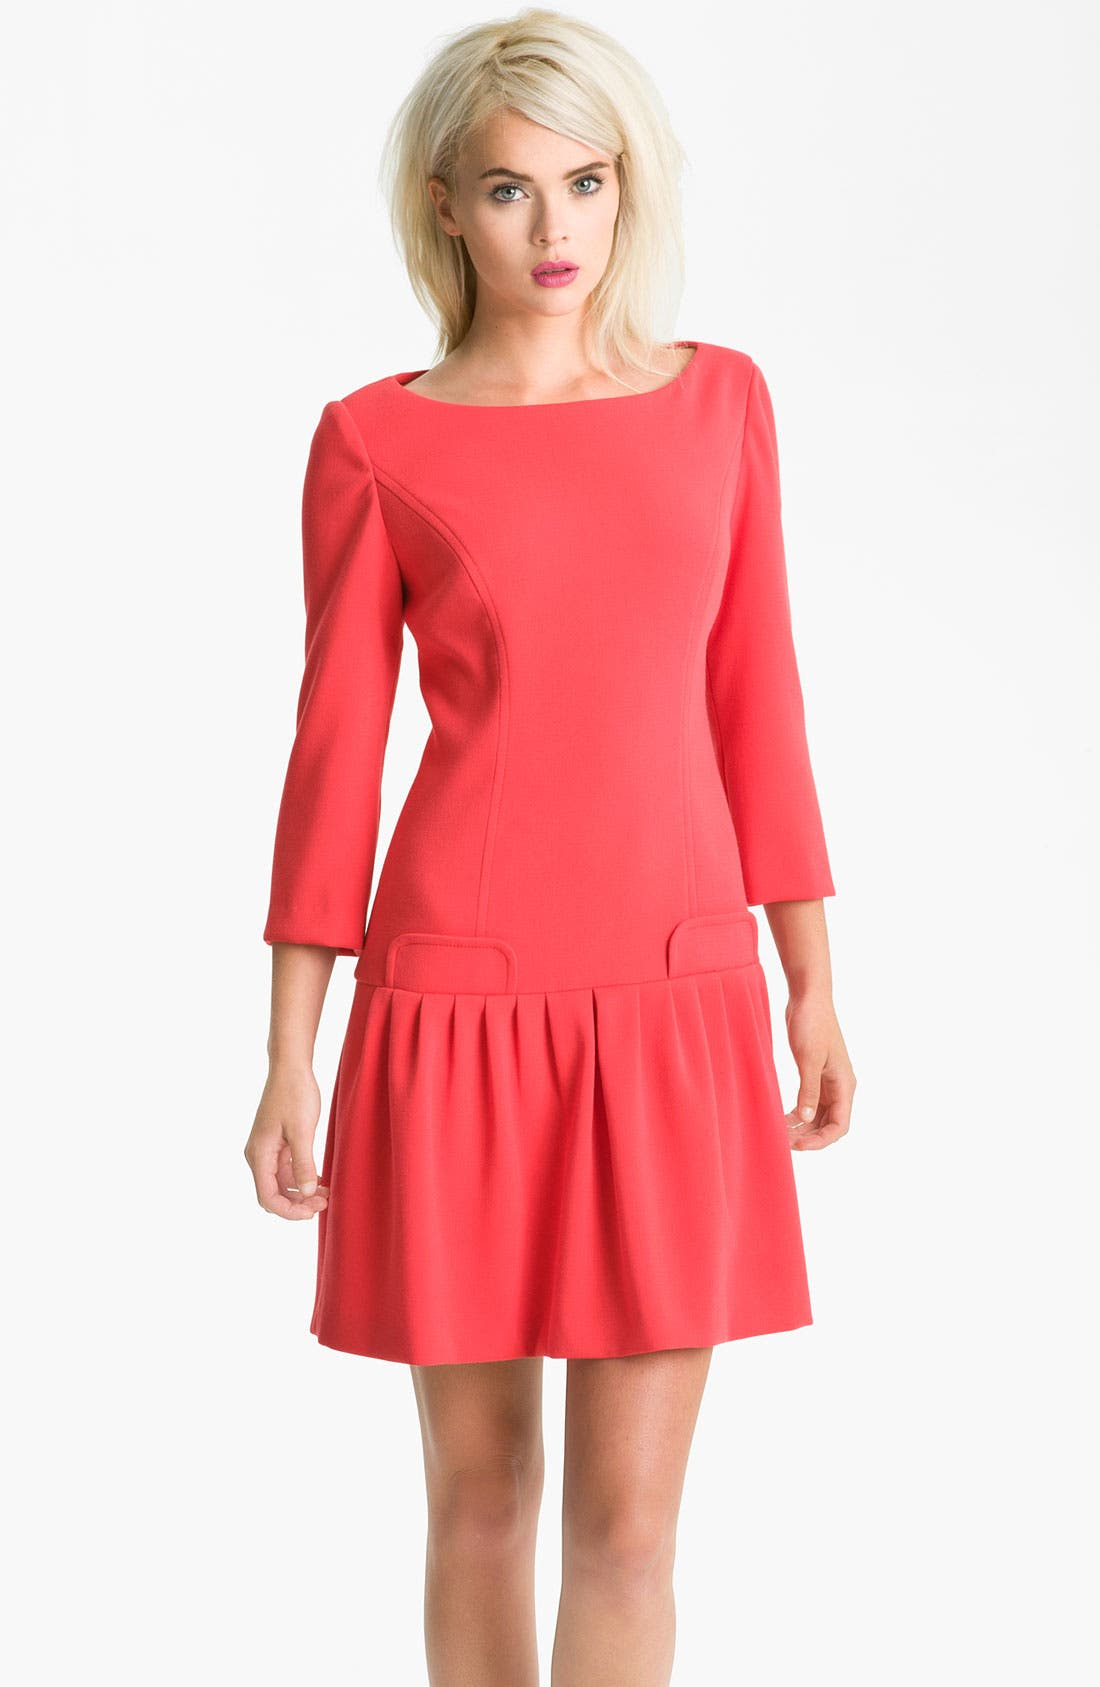 Alternate Image 1 Selected - Eliza J Seam Detail Drop Waist Dress